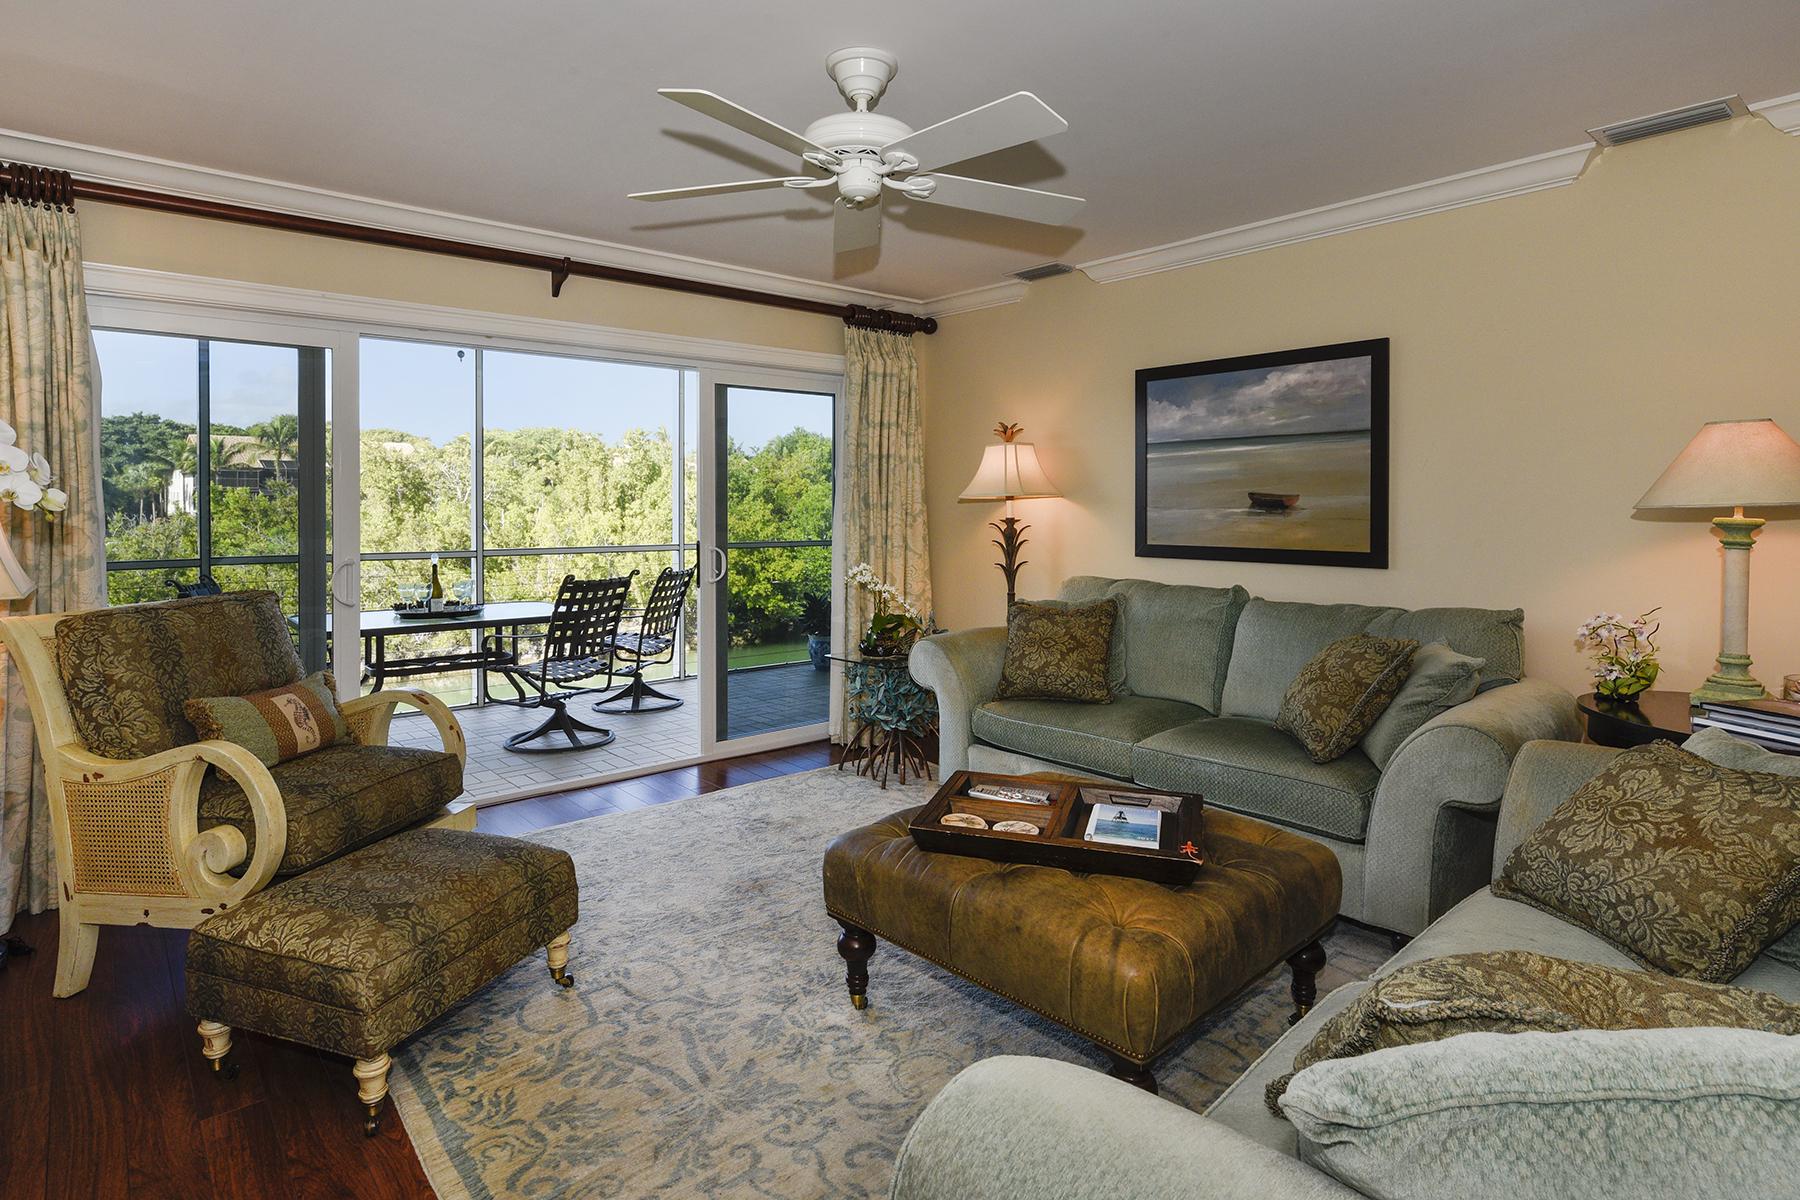 Nhà chung cư vì Bán tại Waterfront Condominium at Ocean Reef 9 Landings, Unit A Ocean Reef Community, Key Largo, Florida, 33037 Hoa Kỳ